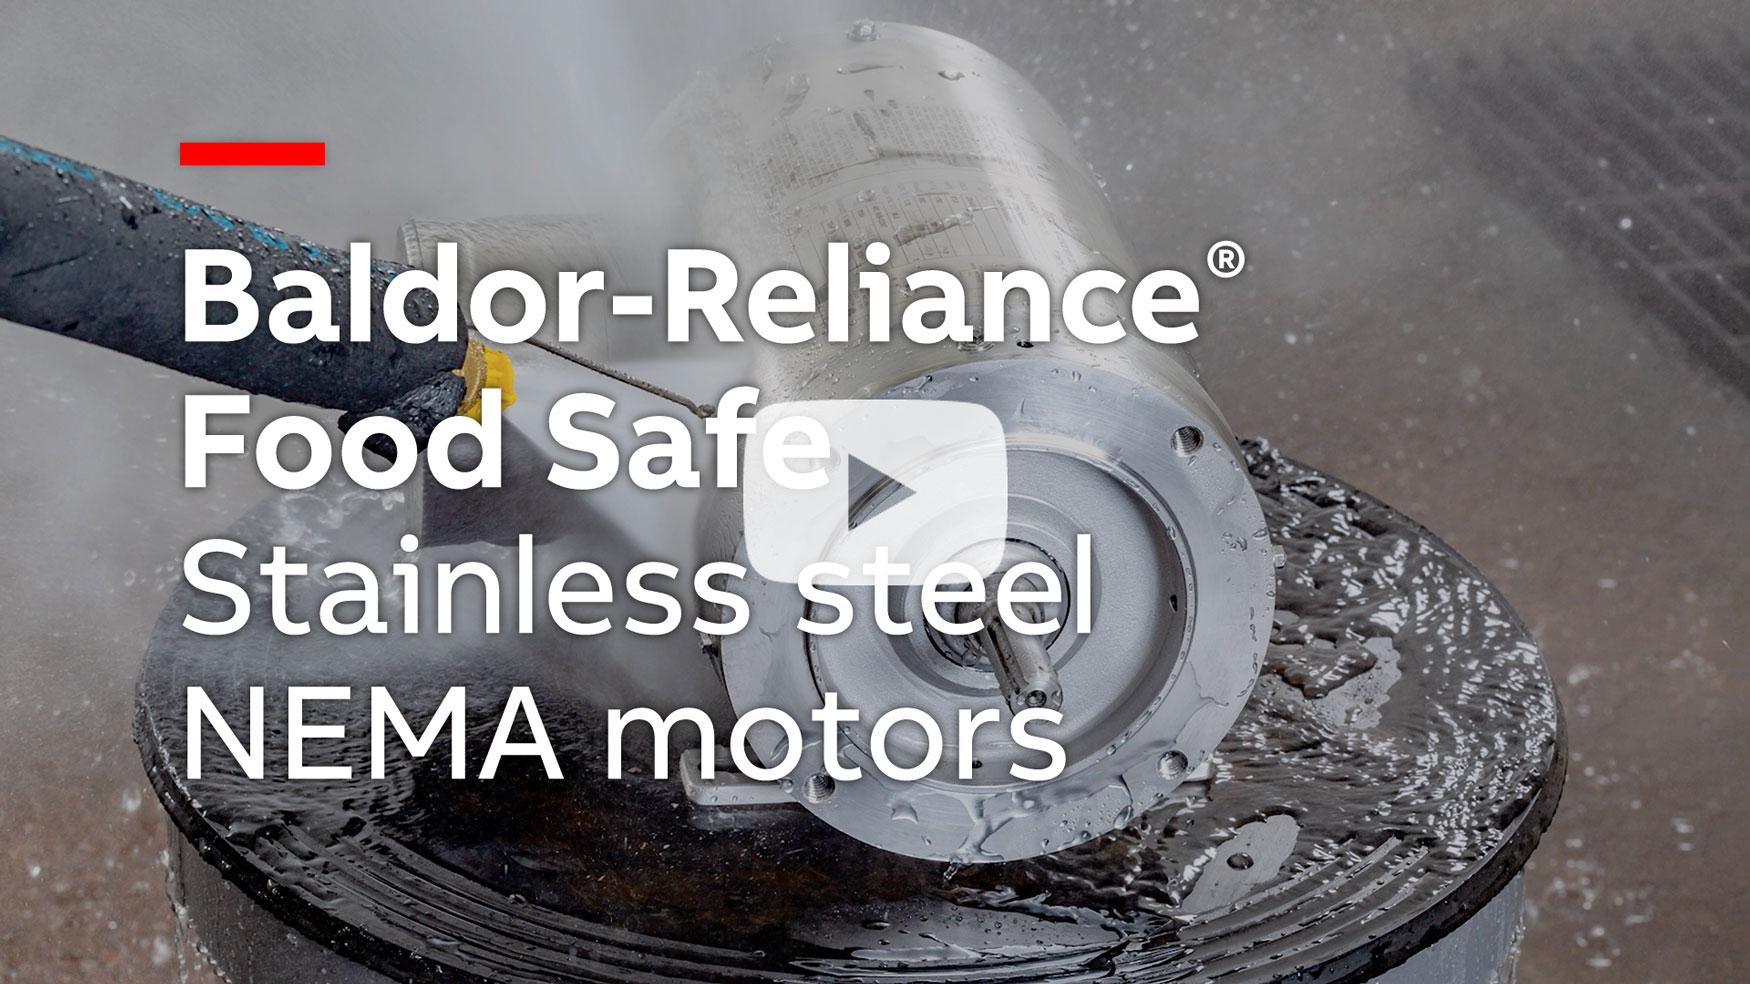 hight resolution of baldor reliance food safe stainless steel nema motors watch video